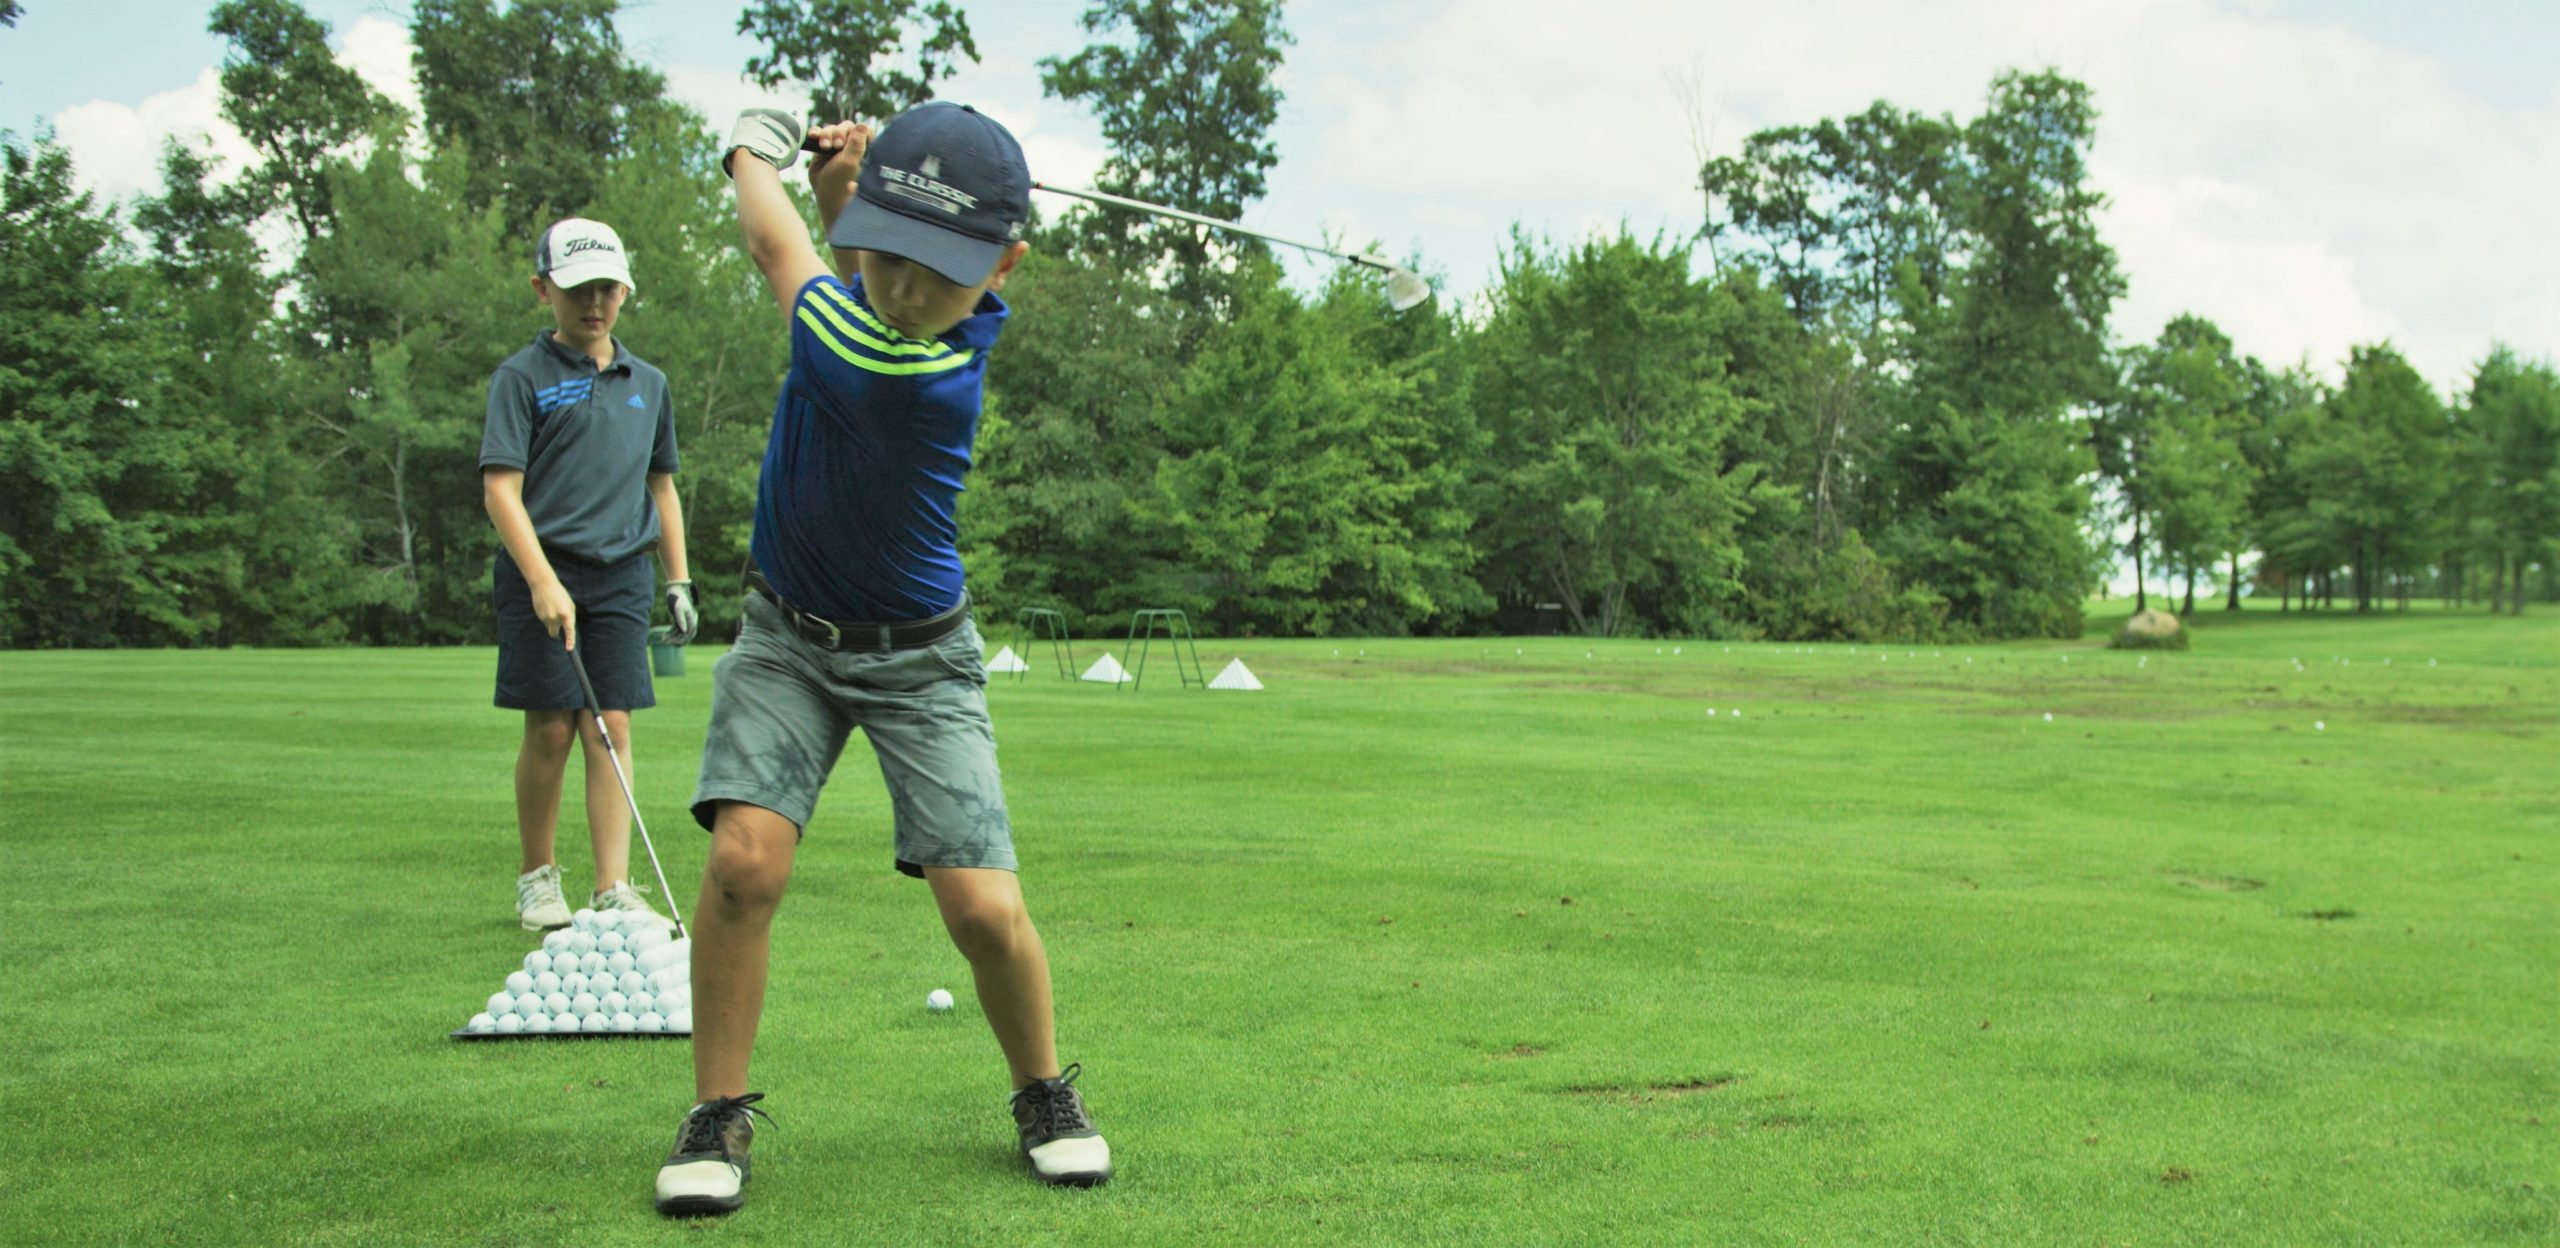 A boy swinging golf club as another boy looks on